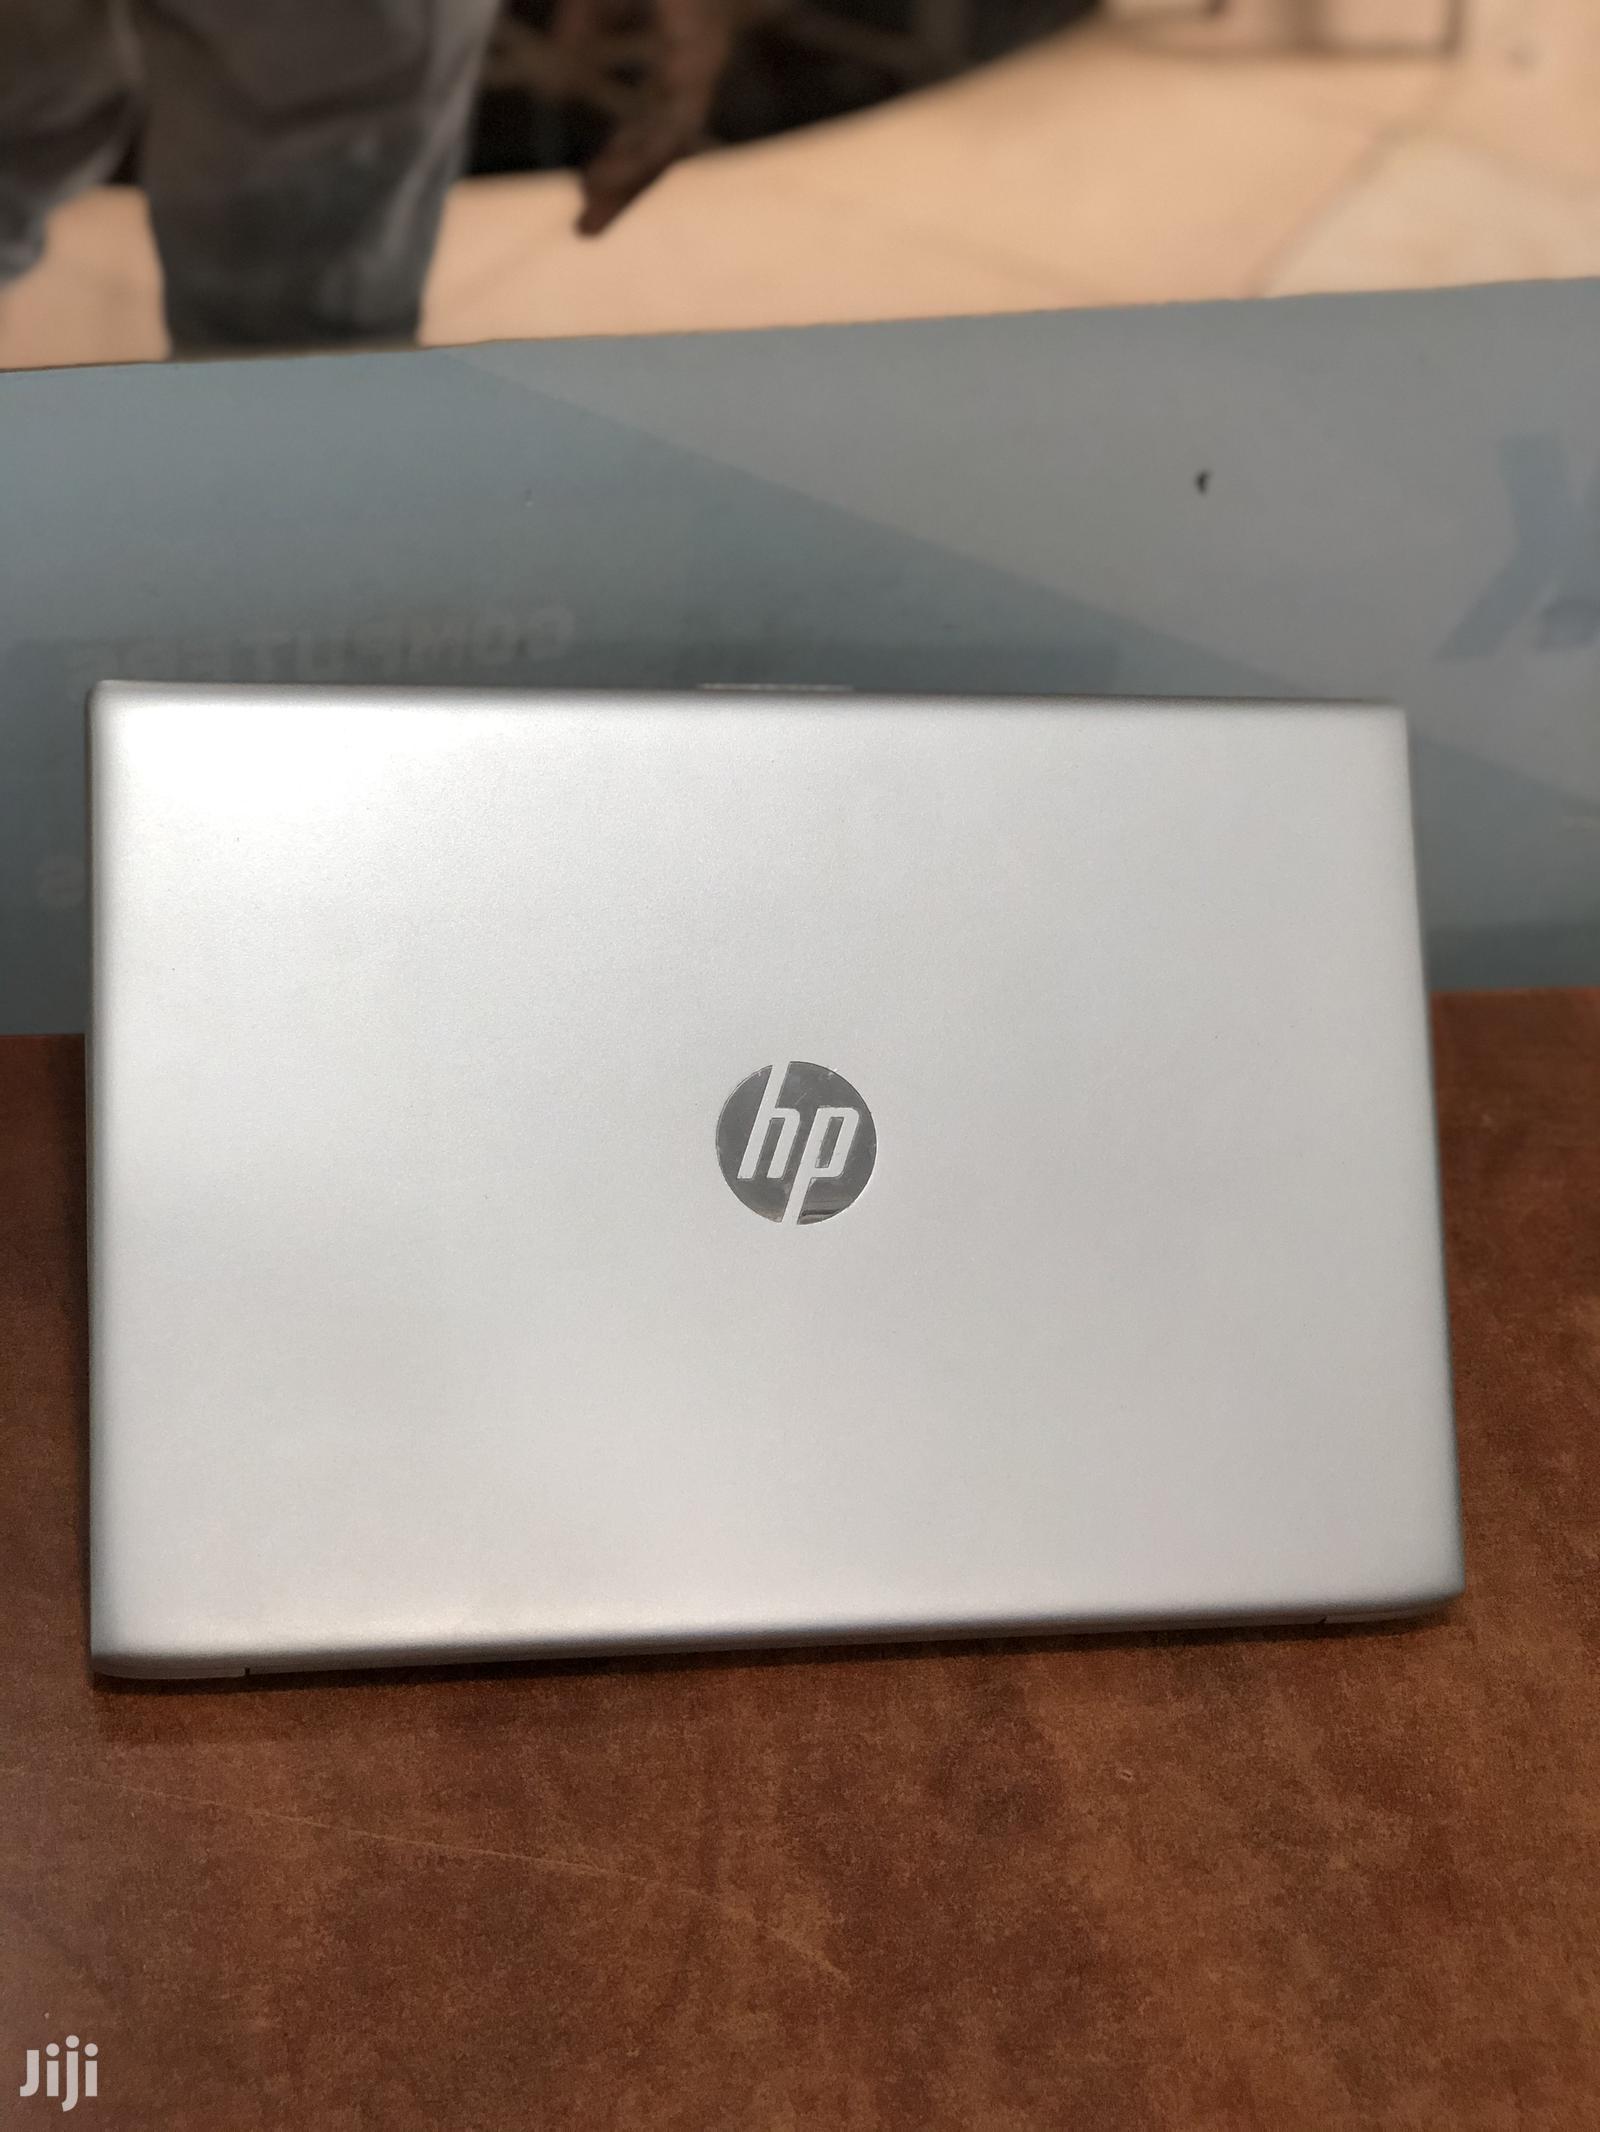 Laptop HP ProBook 450 G5 8GB Intel Core I7 SSHD (Hybrid) 1T | Laptops & Computers for sale in Kampala, Central Region, Uganda